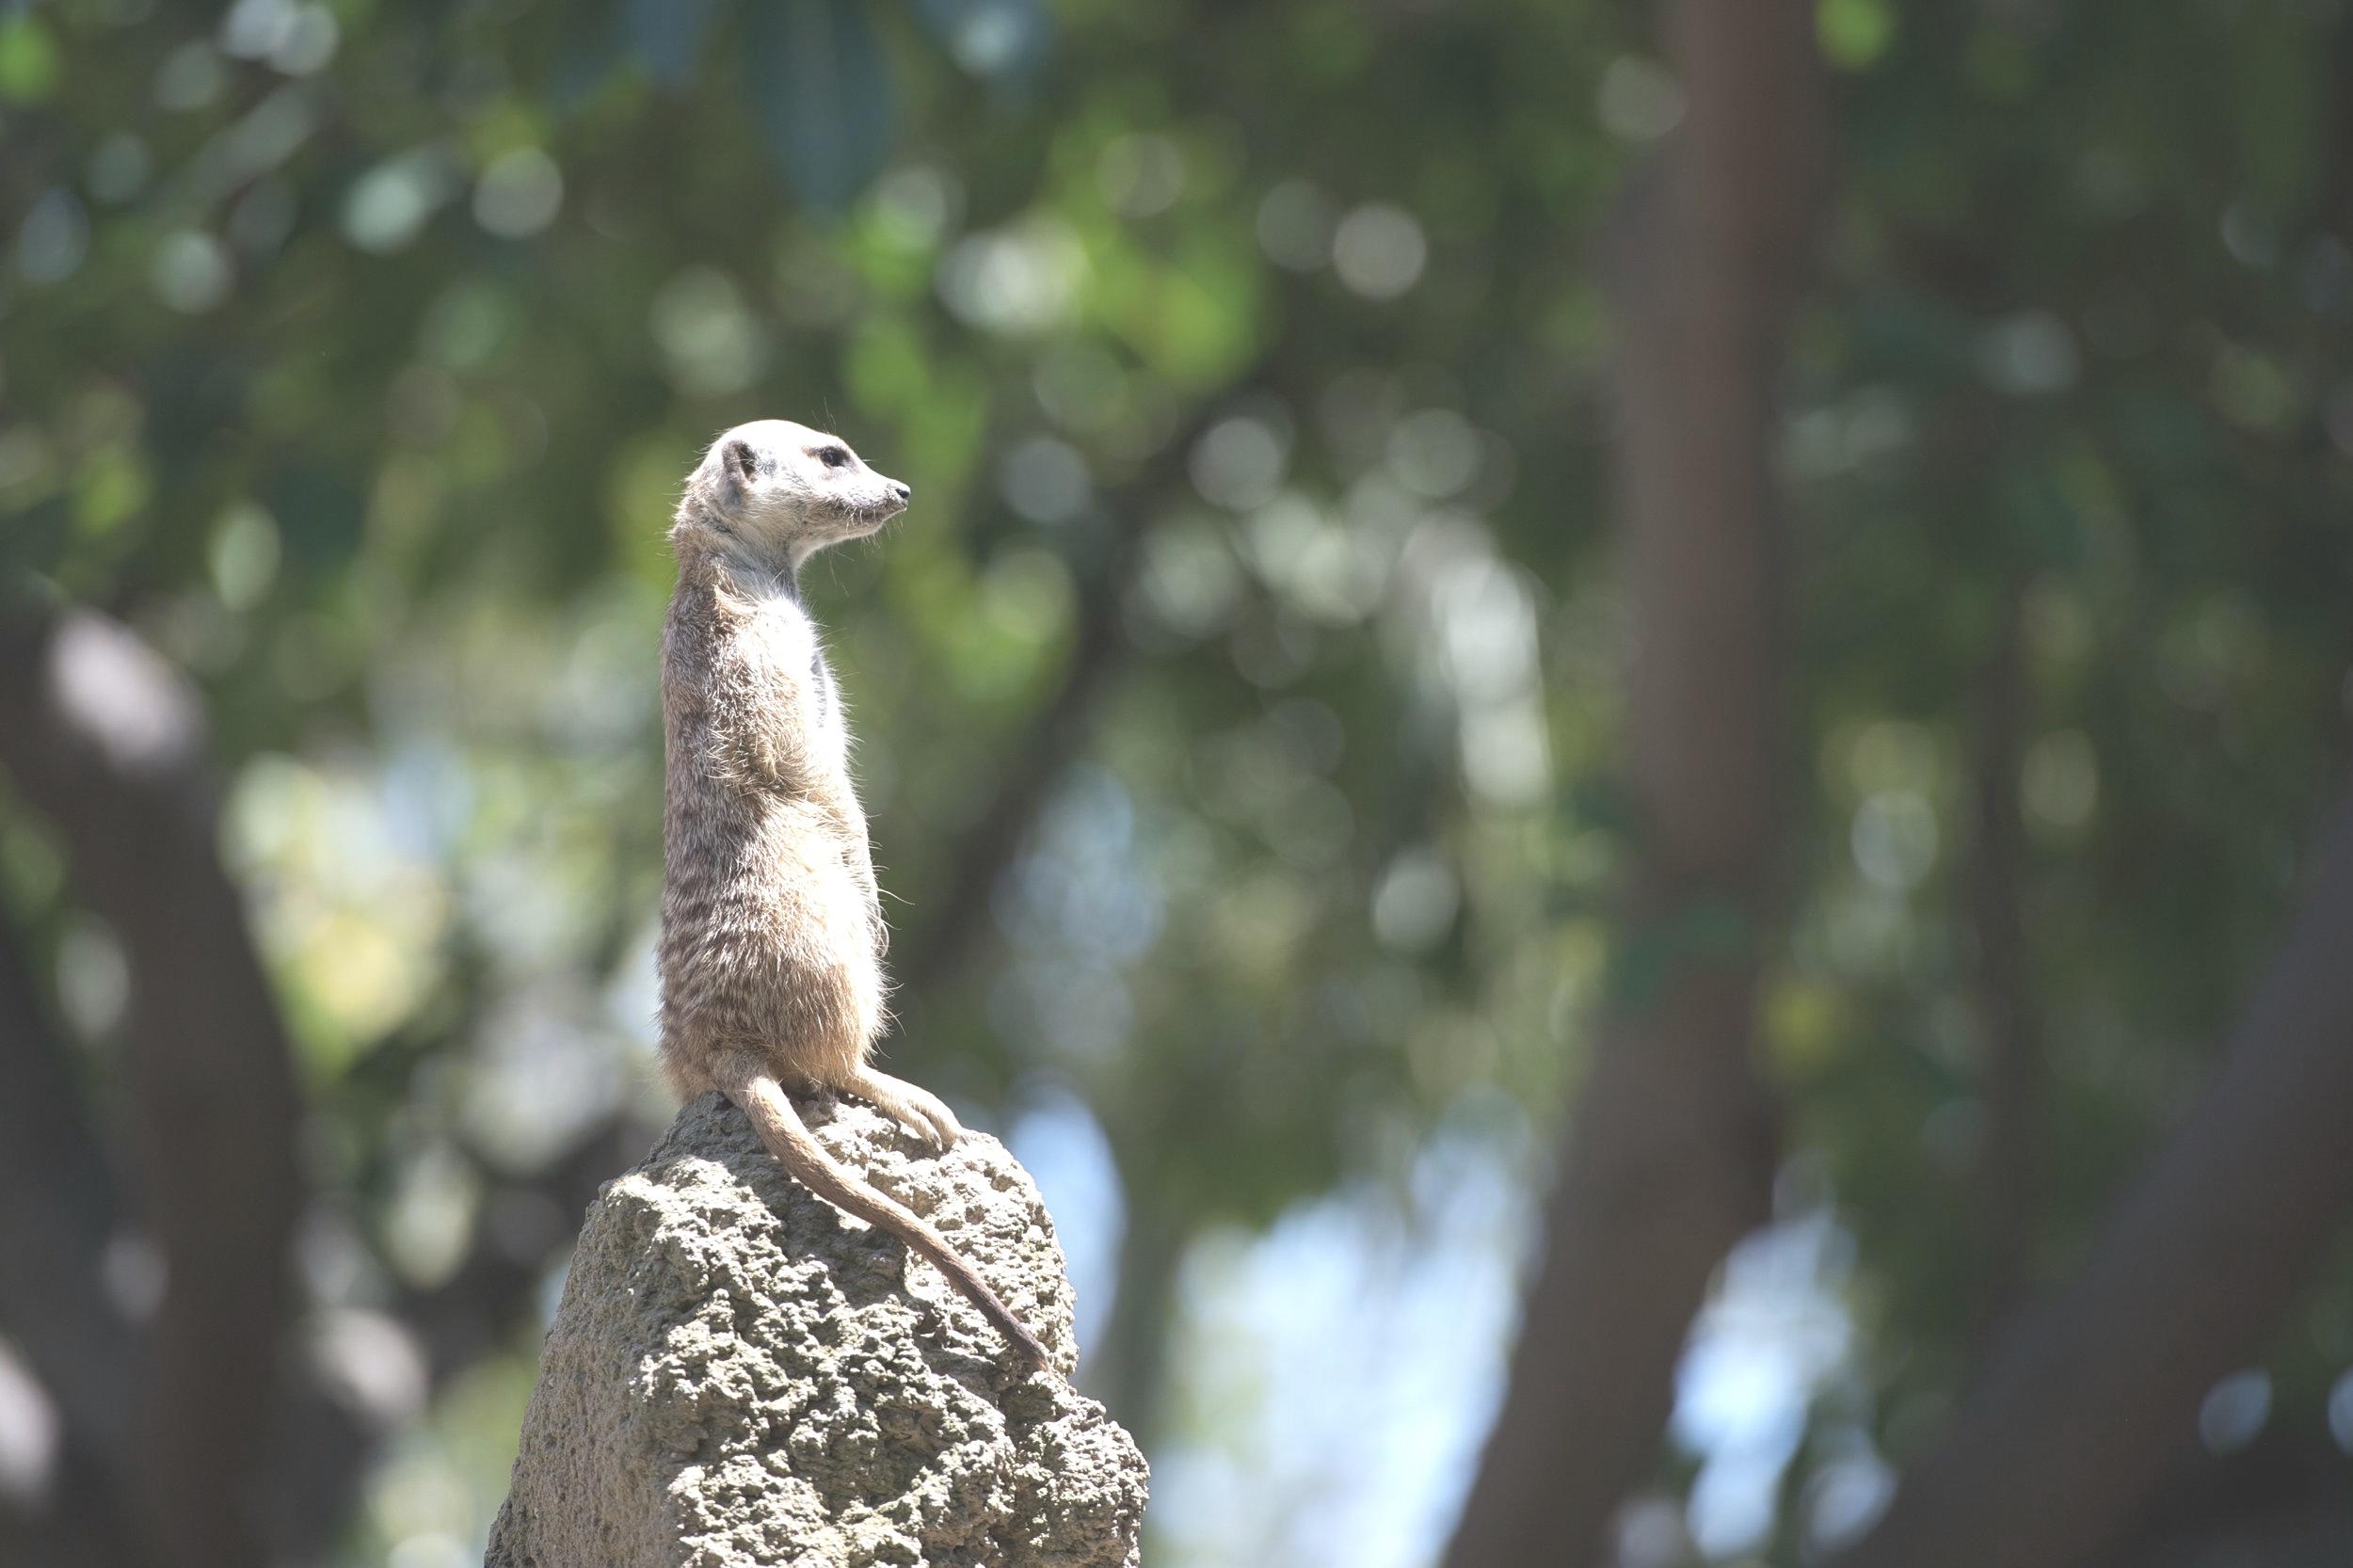 3) Upright,confident posture. -